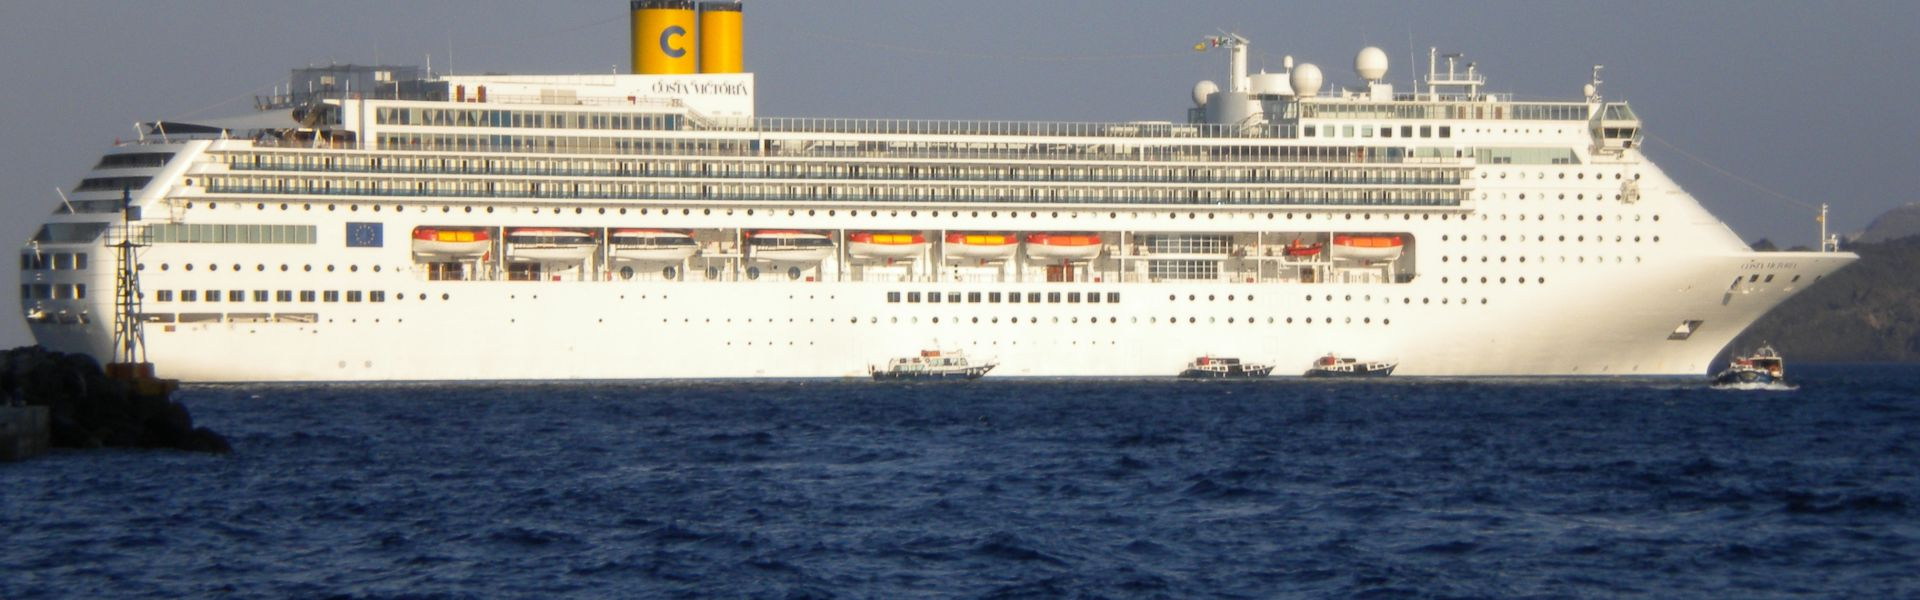 Croaziera 2018 - Mediterana de Vest (Savona) - Costa Victoria - Costa Cruises - 7 nopti